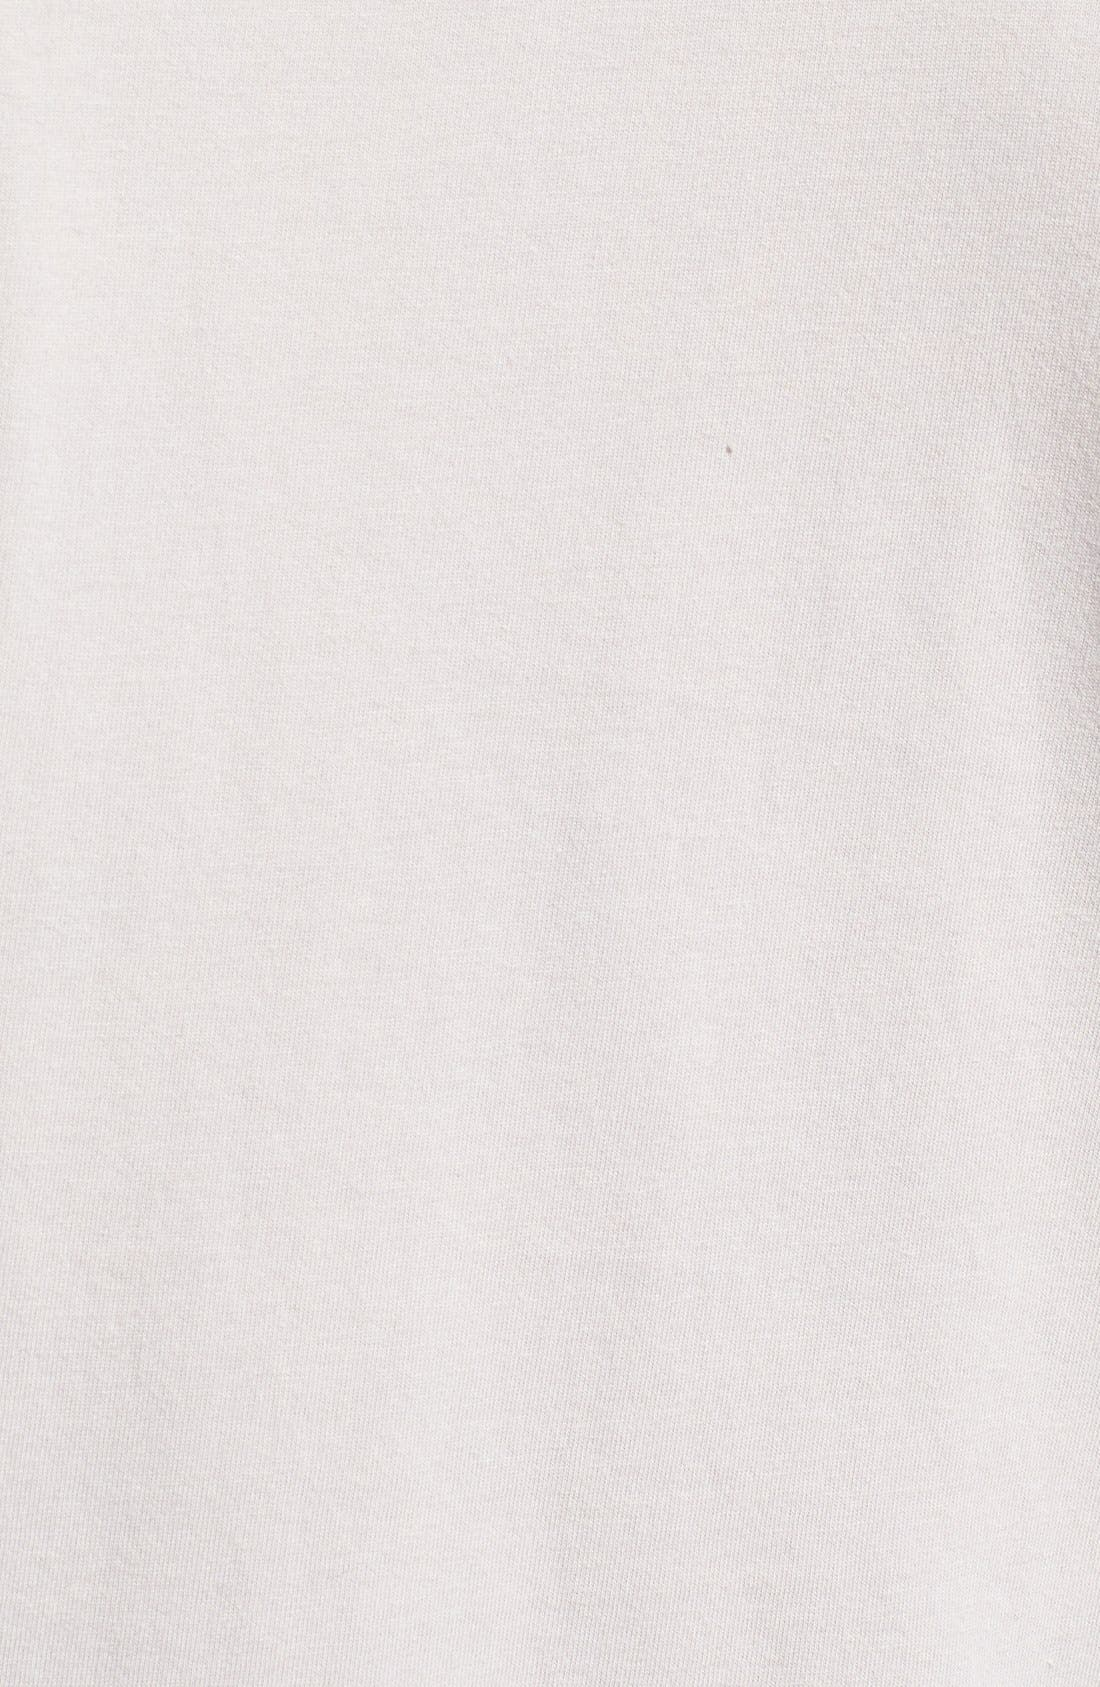 Alternate Image 3  - Red Jacket 'Yankees - Remote Control' T-Shirt (Men)